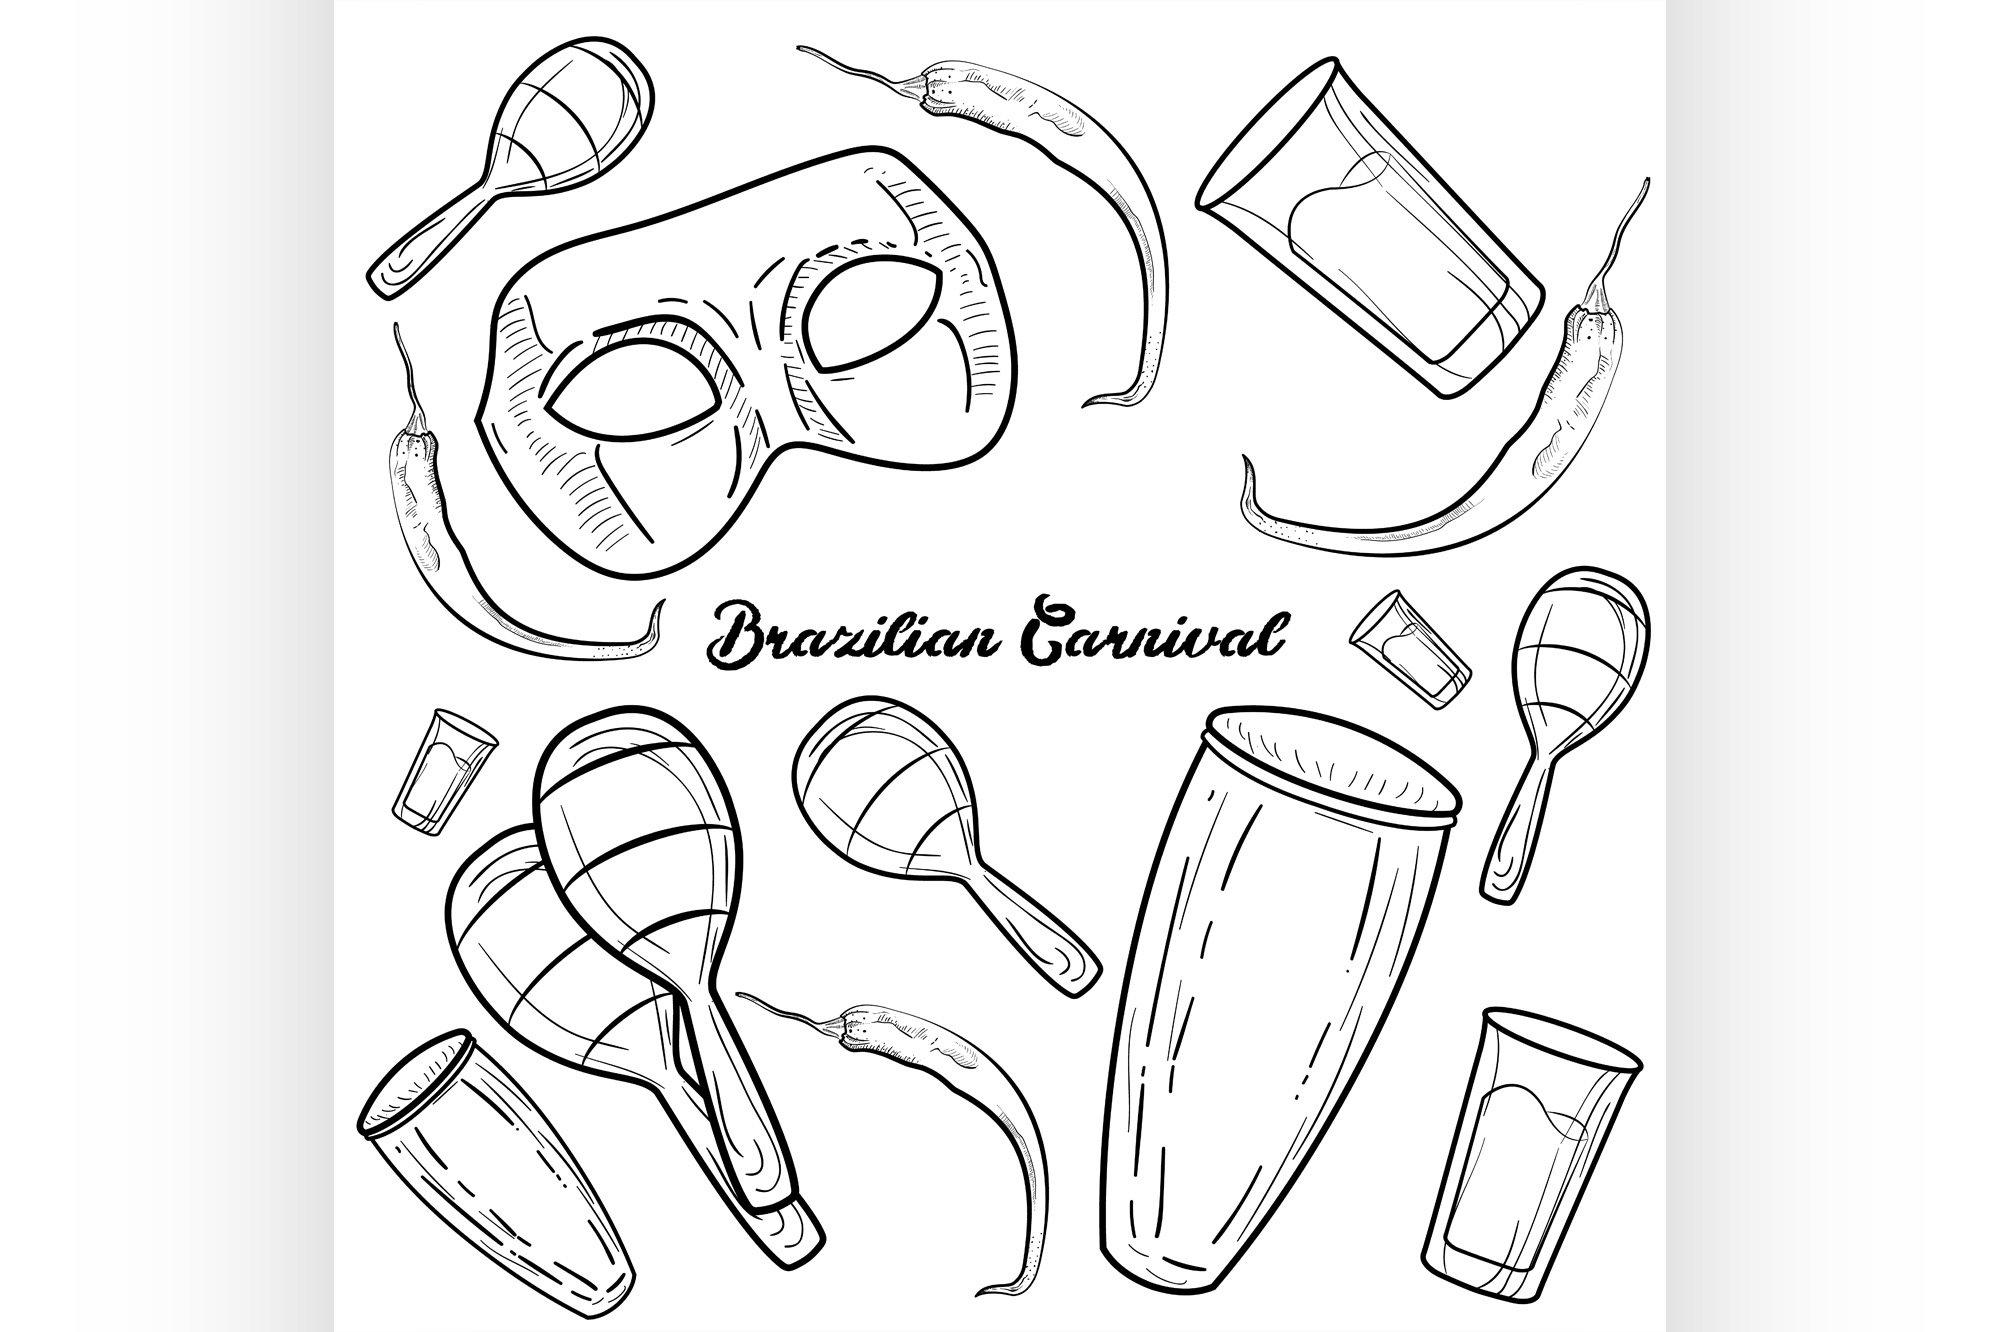 Hand drawn Brazilian Carnival element example image 1